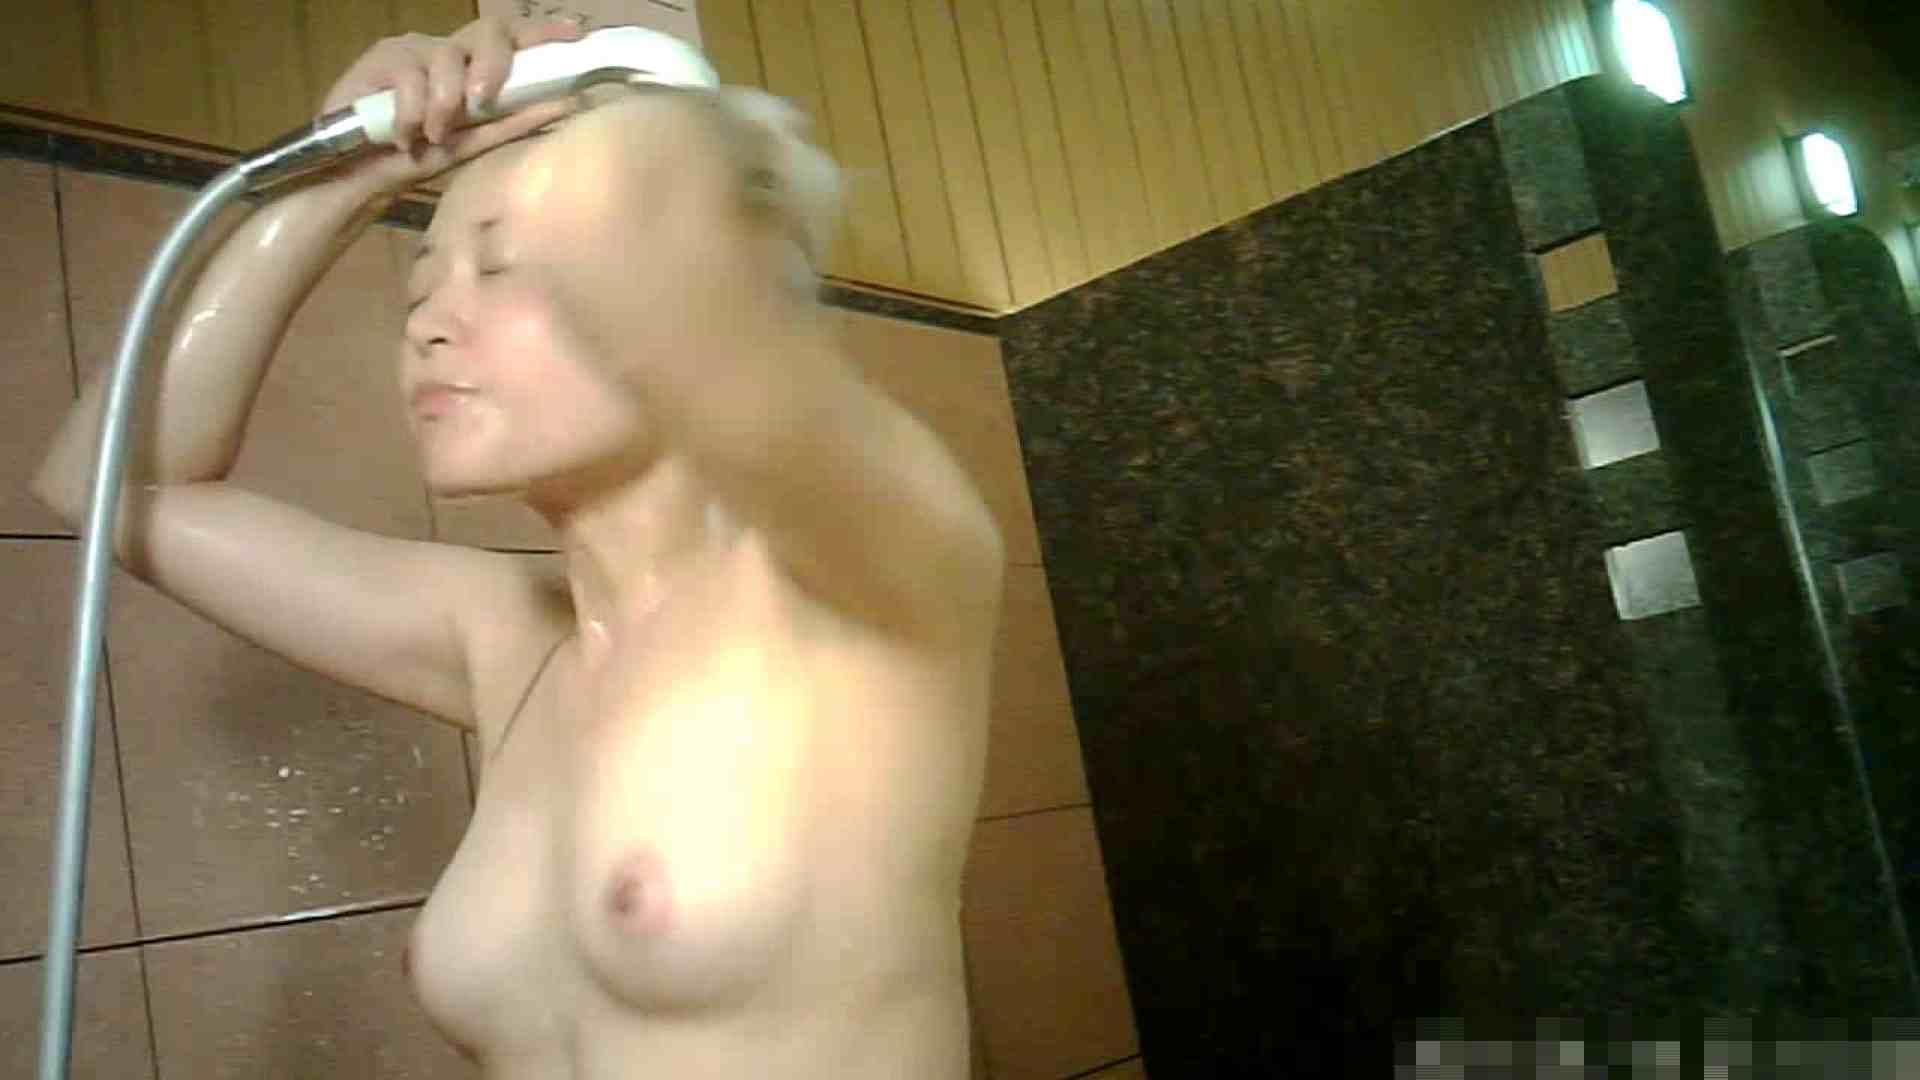 No.1 洗い場!!とっても綺麗な身体のお女市さん、乳首も綺麗です。 銭湯着替え ワレメ無修正動画無料 98画像 38